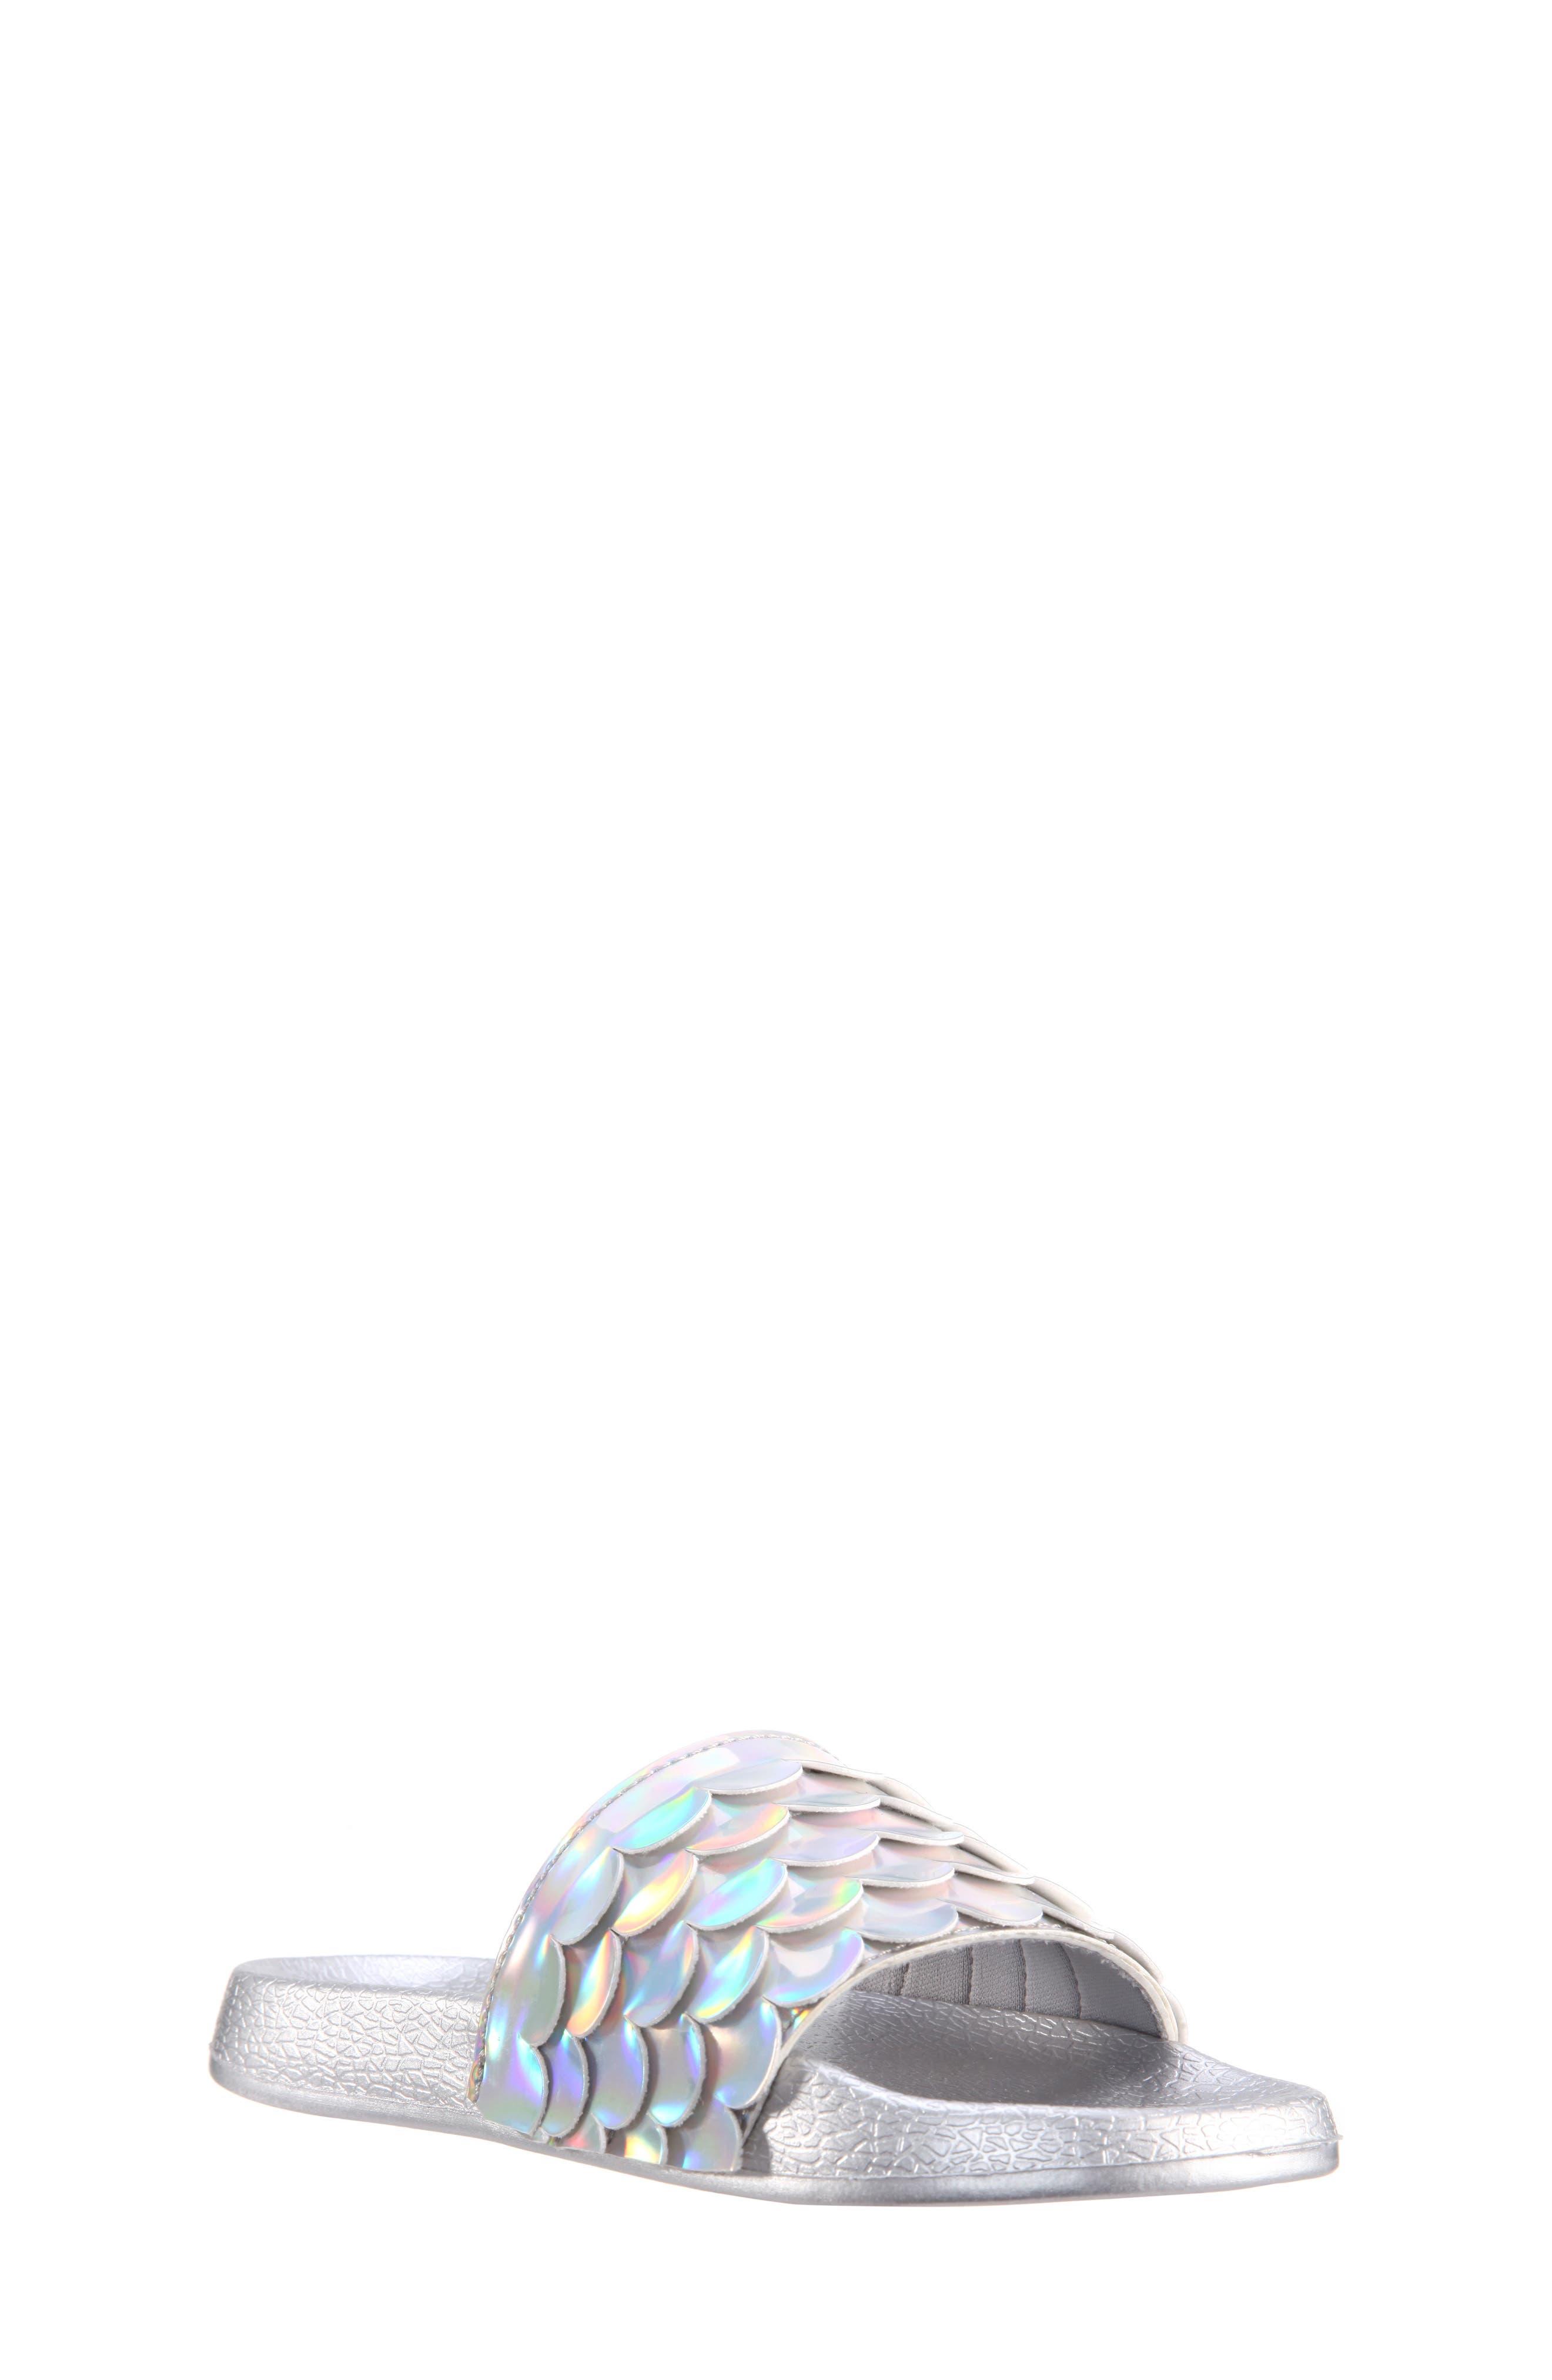 Mermaid Sport Slide Sandal,                         Main,                         color, Silver Mirror Metallic